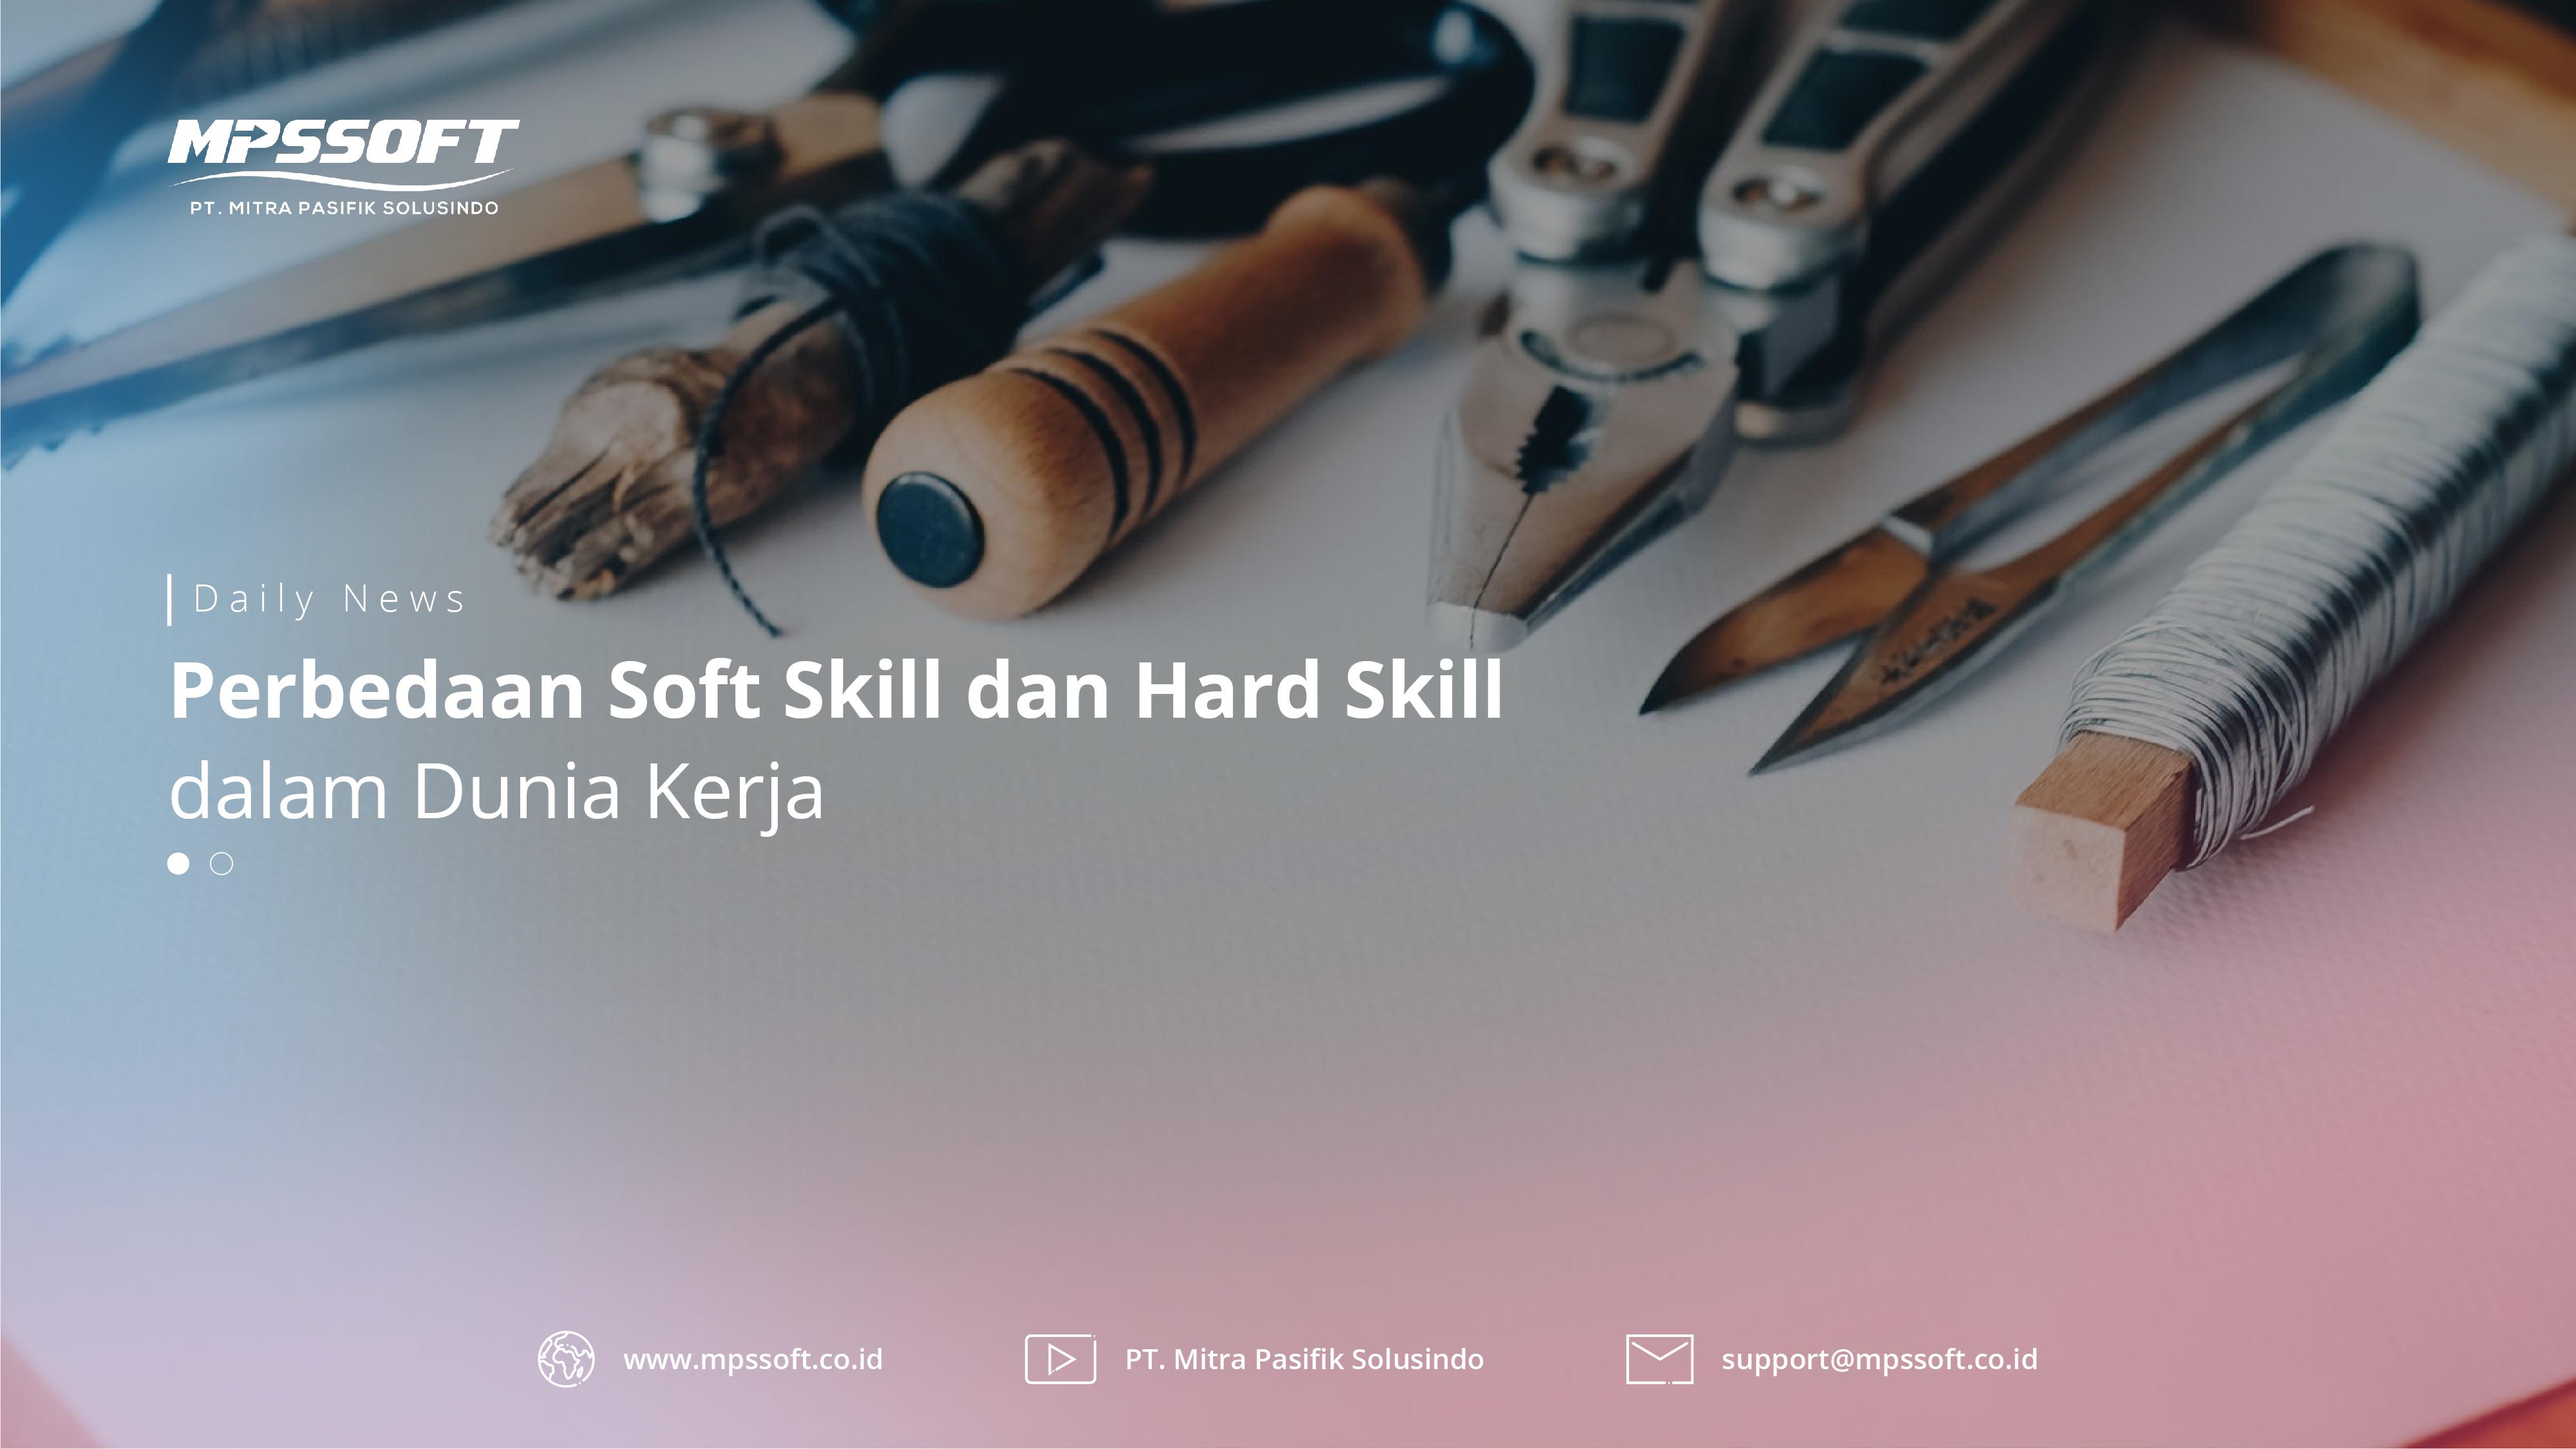 Perbedaan Soft Skill dan Hard Skill Dalam Dunia Kerja